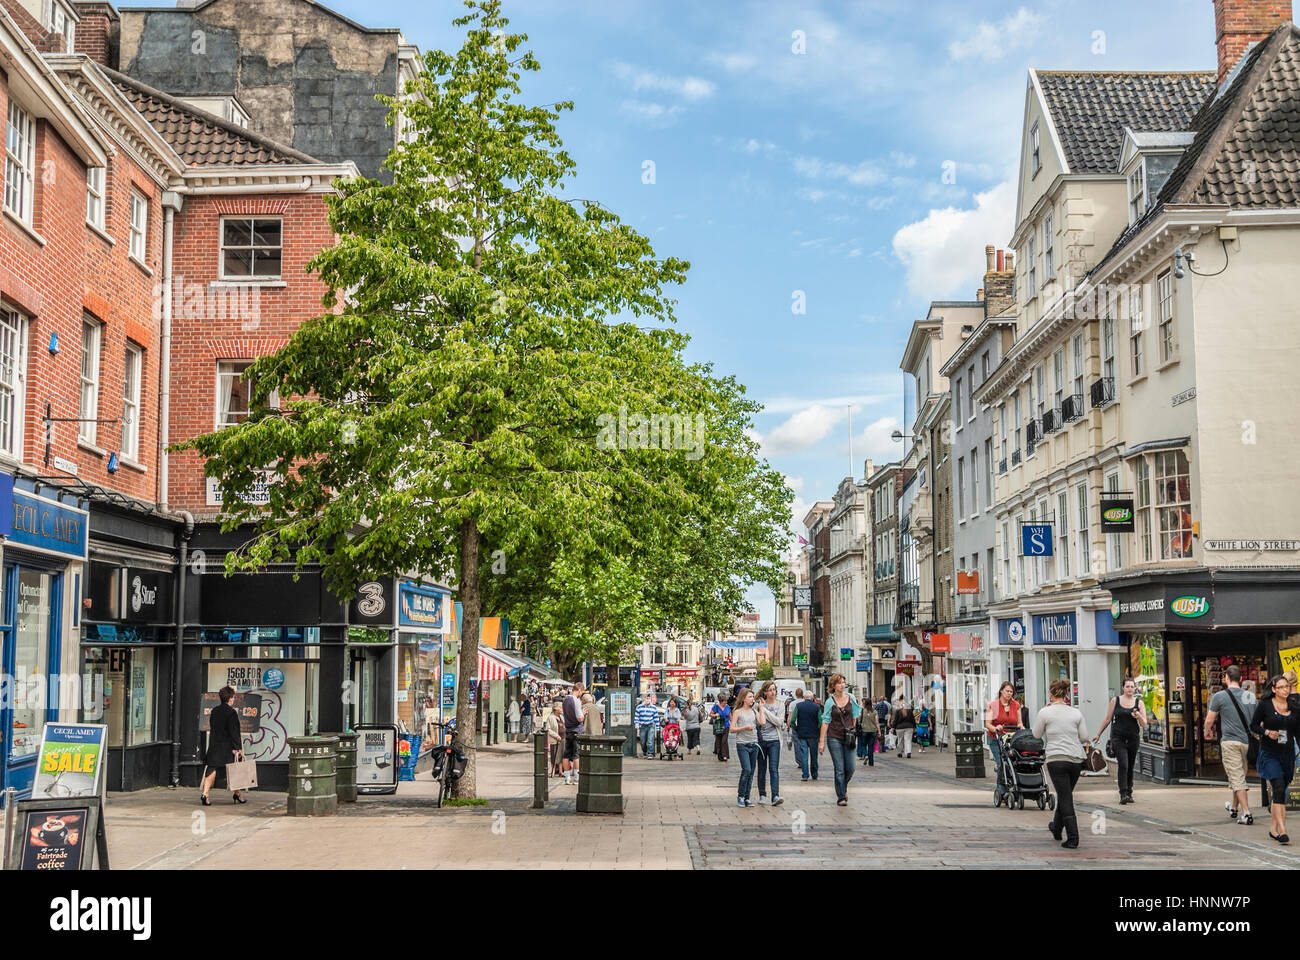 Busy Shopping Street in the town centre of Norwich in Norfolk, England, UK.    Einkaufsstrasse in der Innenstadt - Stock Image